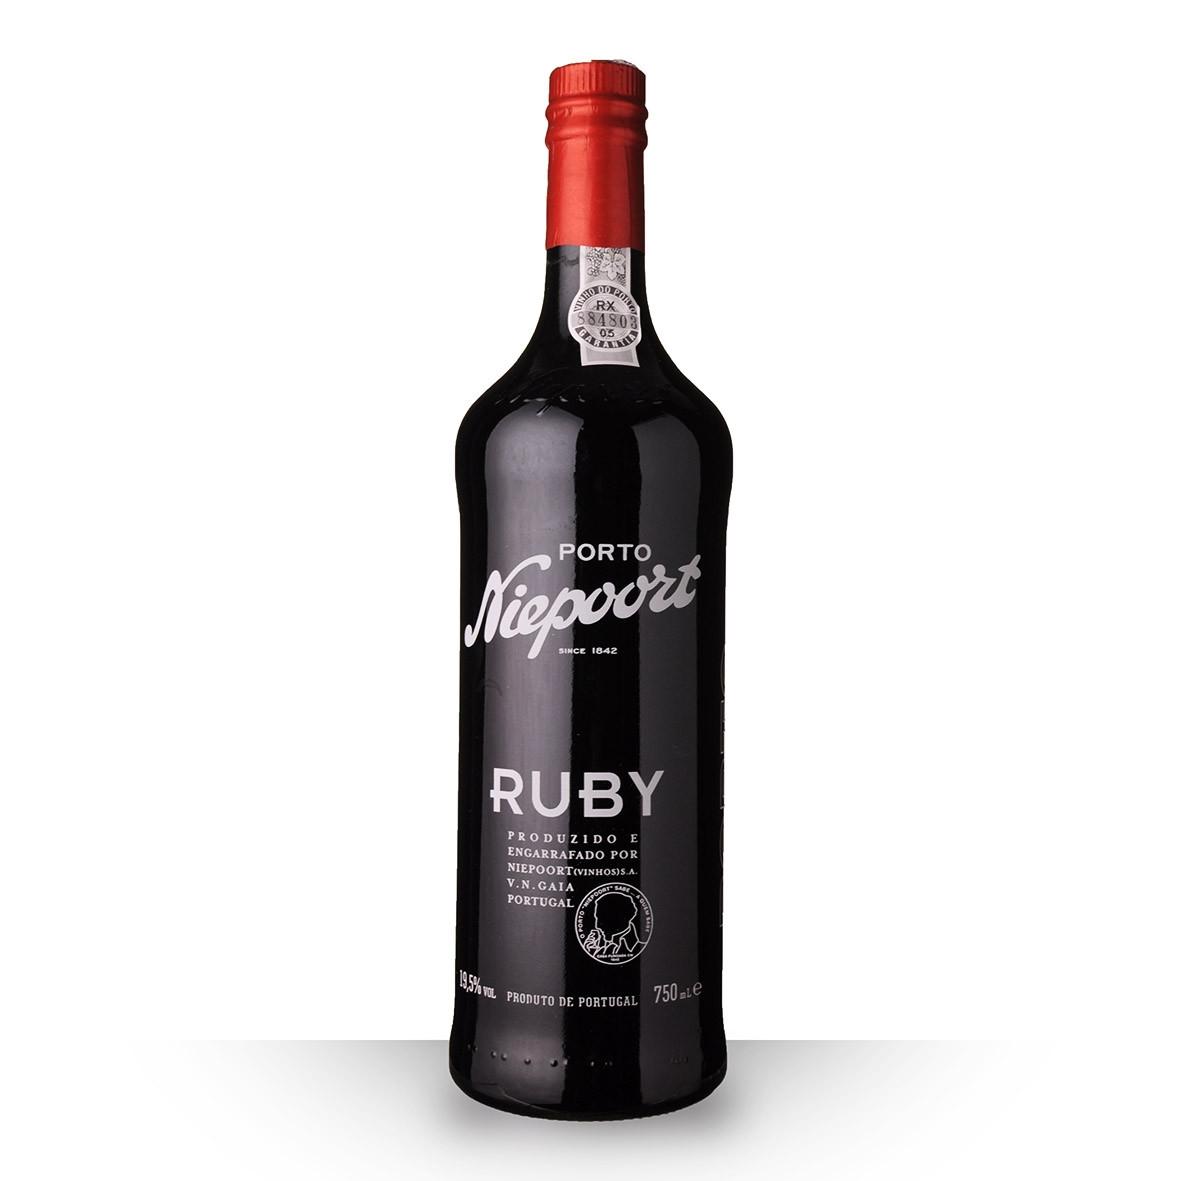 Porto Niepoort Ruby 75cl www.odyssee-vins.com